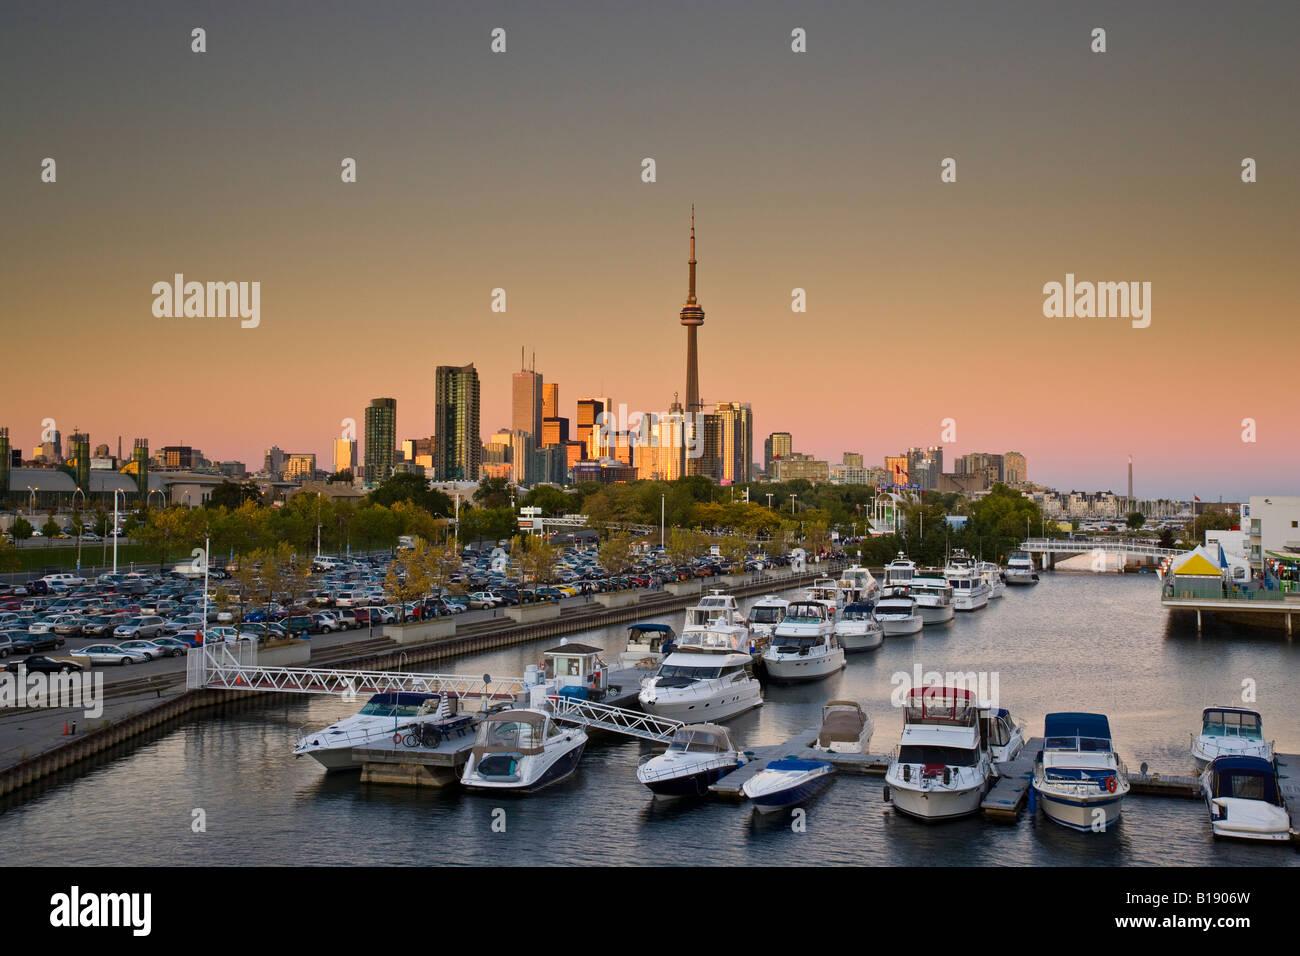 Horizonte de Toronto y Ontario Place al atardecer, Toronto, Ontario, Canadá. Imagen De Stock